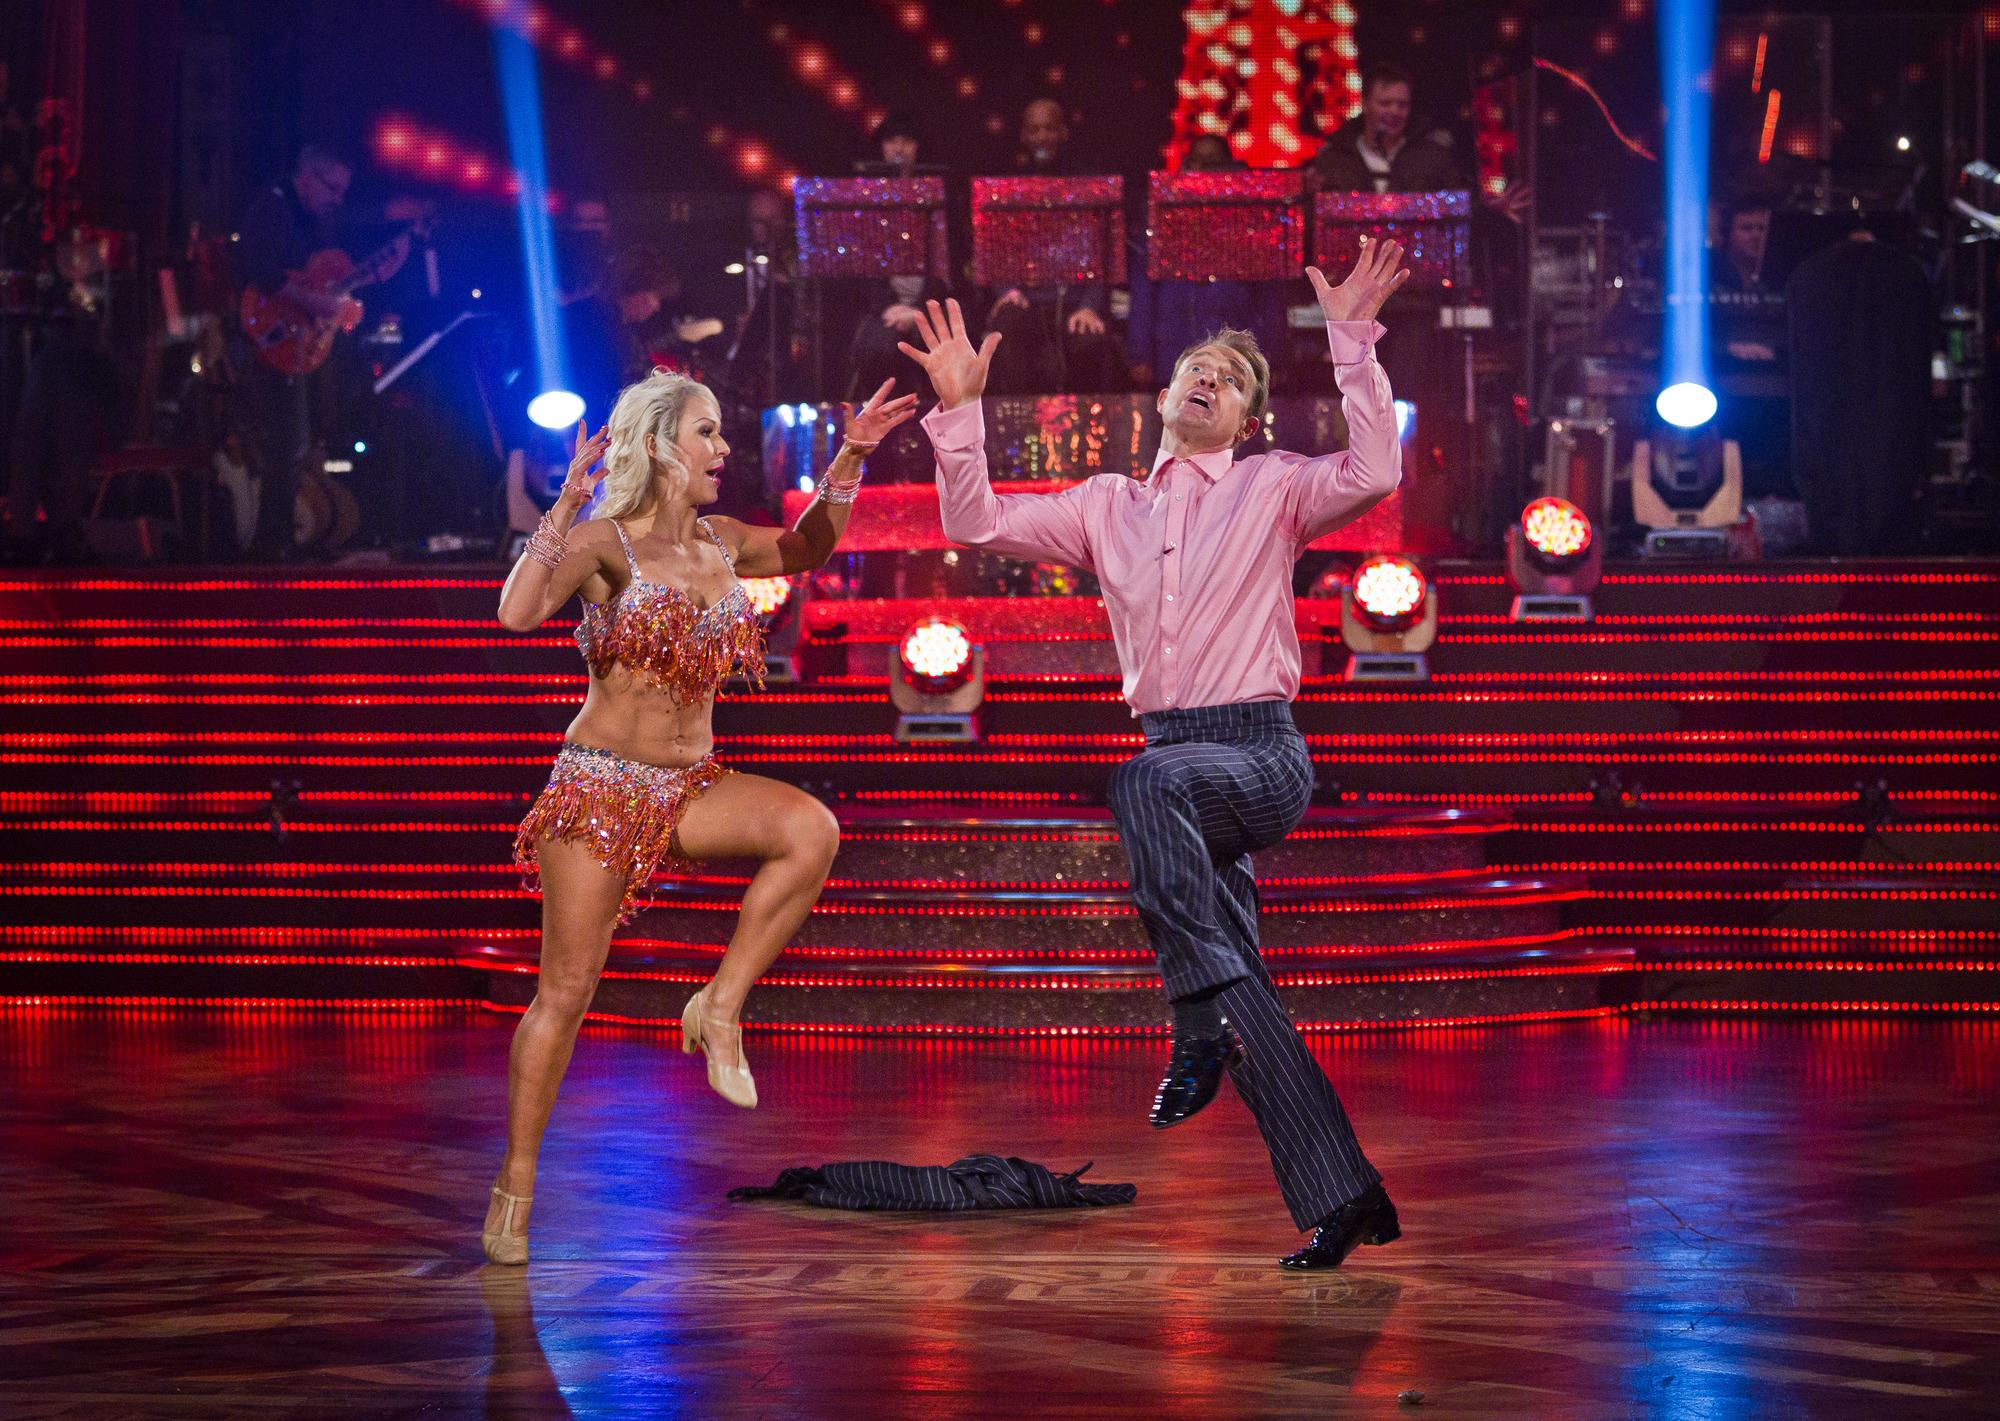 Jason And Kristina dance their Show Dance to Dancin' Fool by Gary Wilmot